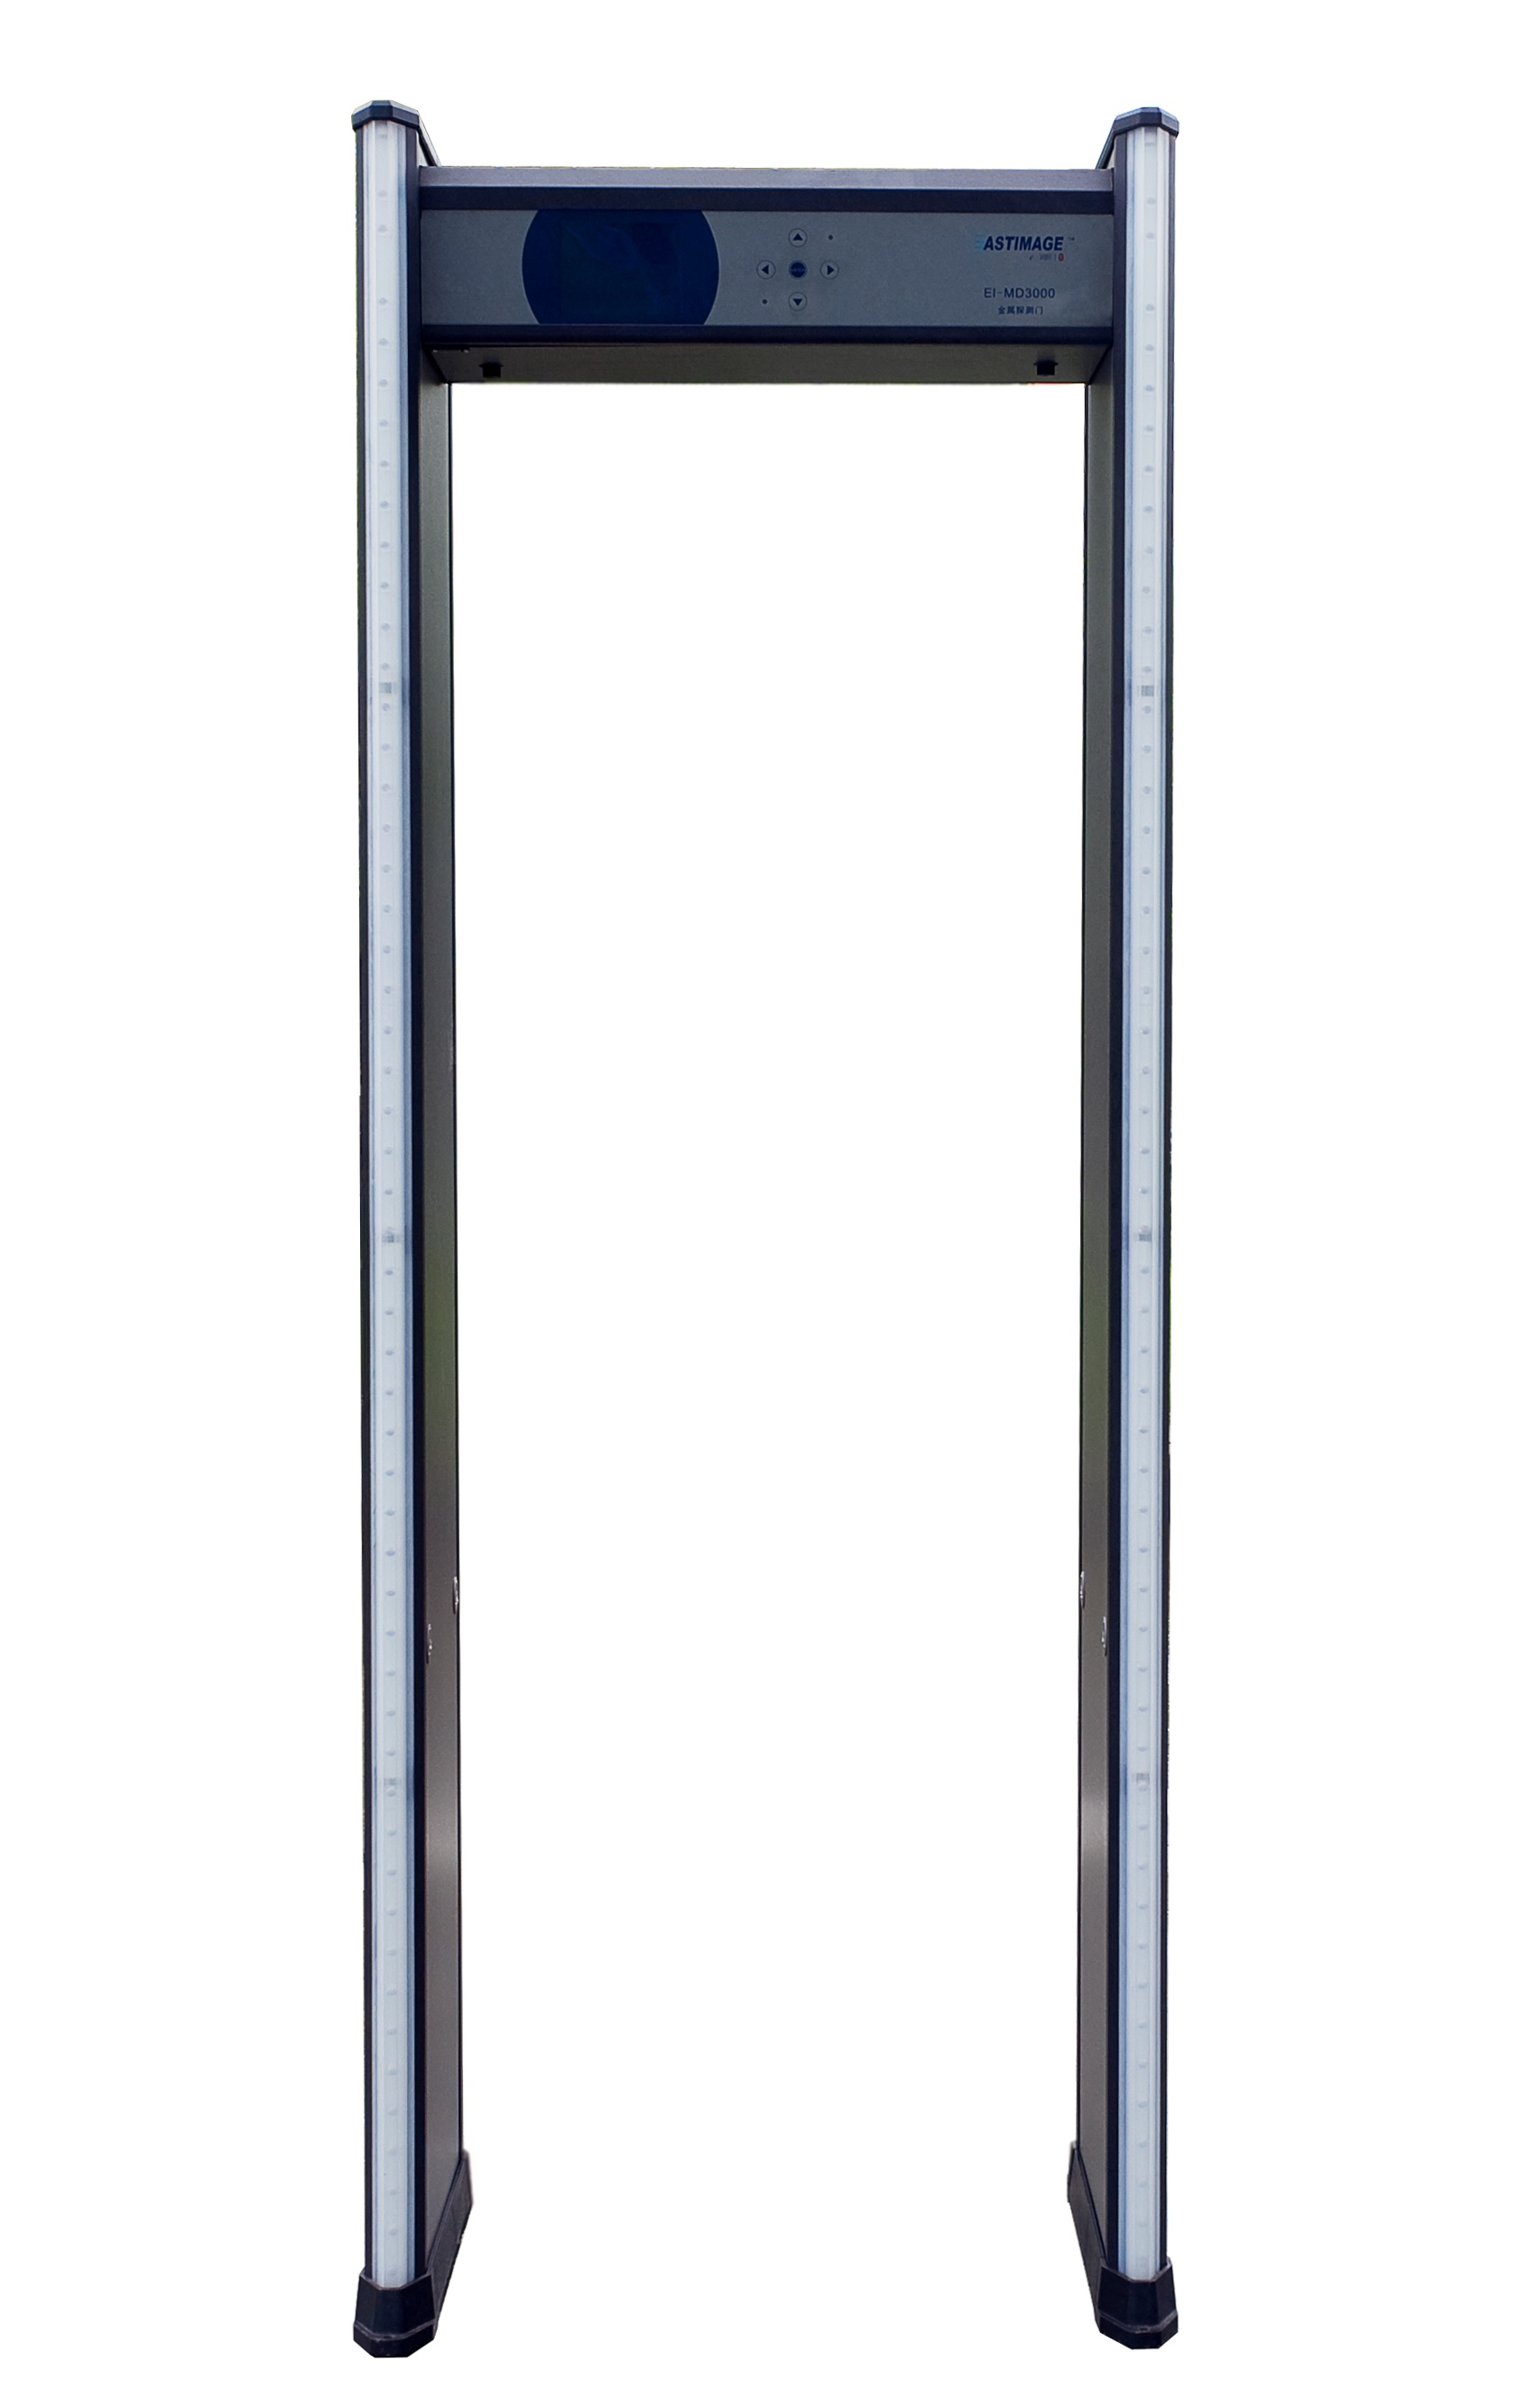 MD3000 Walkthrough metaldetector.